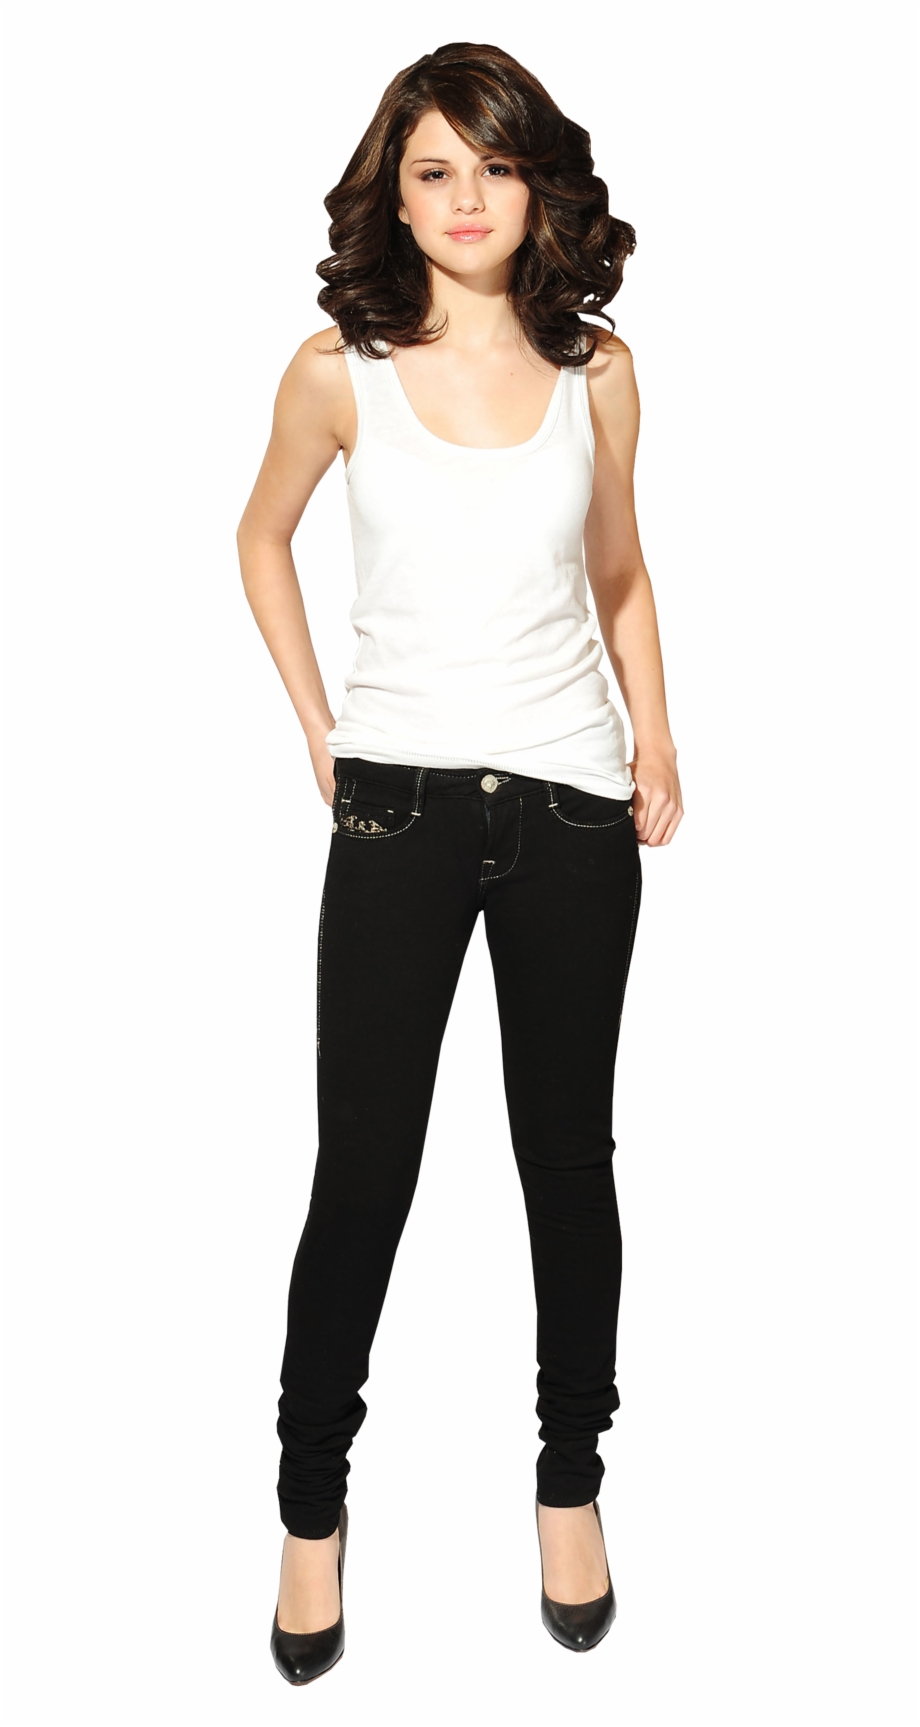 Selena gomez 2014 clipart banner freeuse Selena Gomez Full Body Png - Nipsey Hussle Tank Top Womens ... banner freeuse